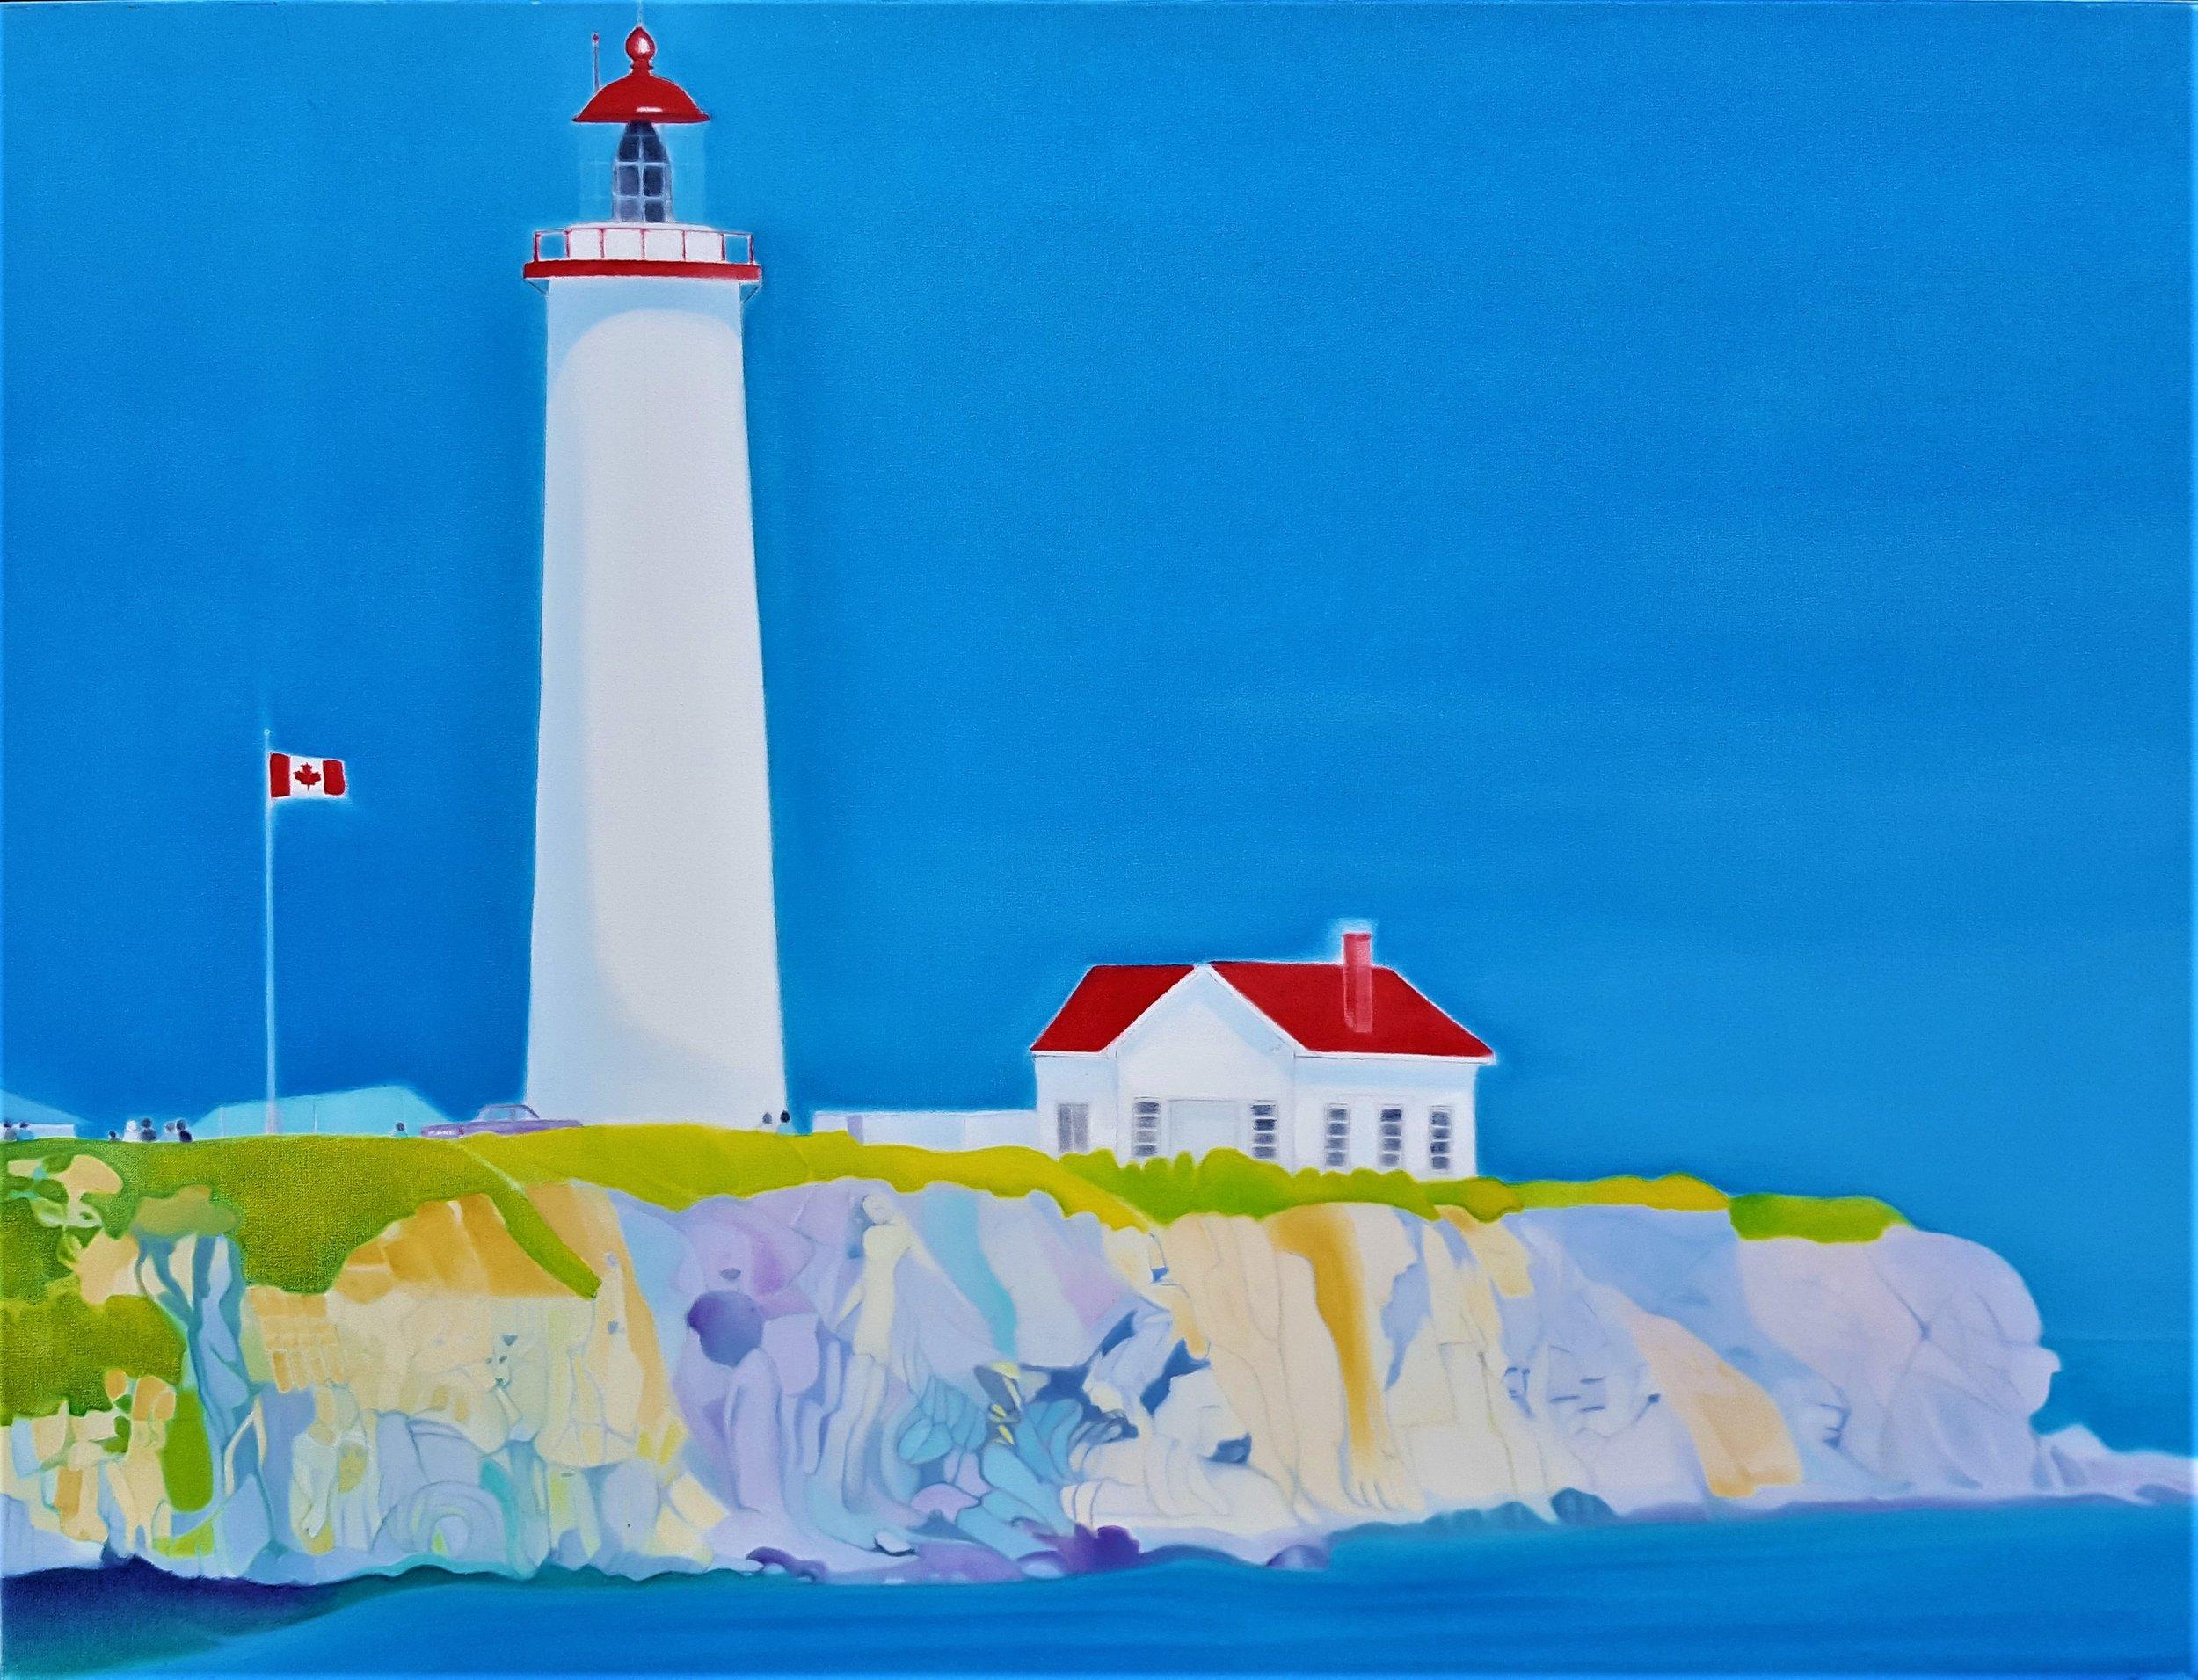 Millie_The Lighthouse_Painting_48x36_2006.jpg